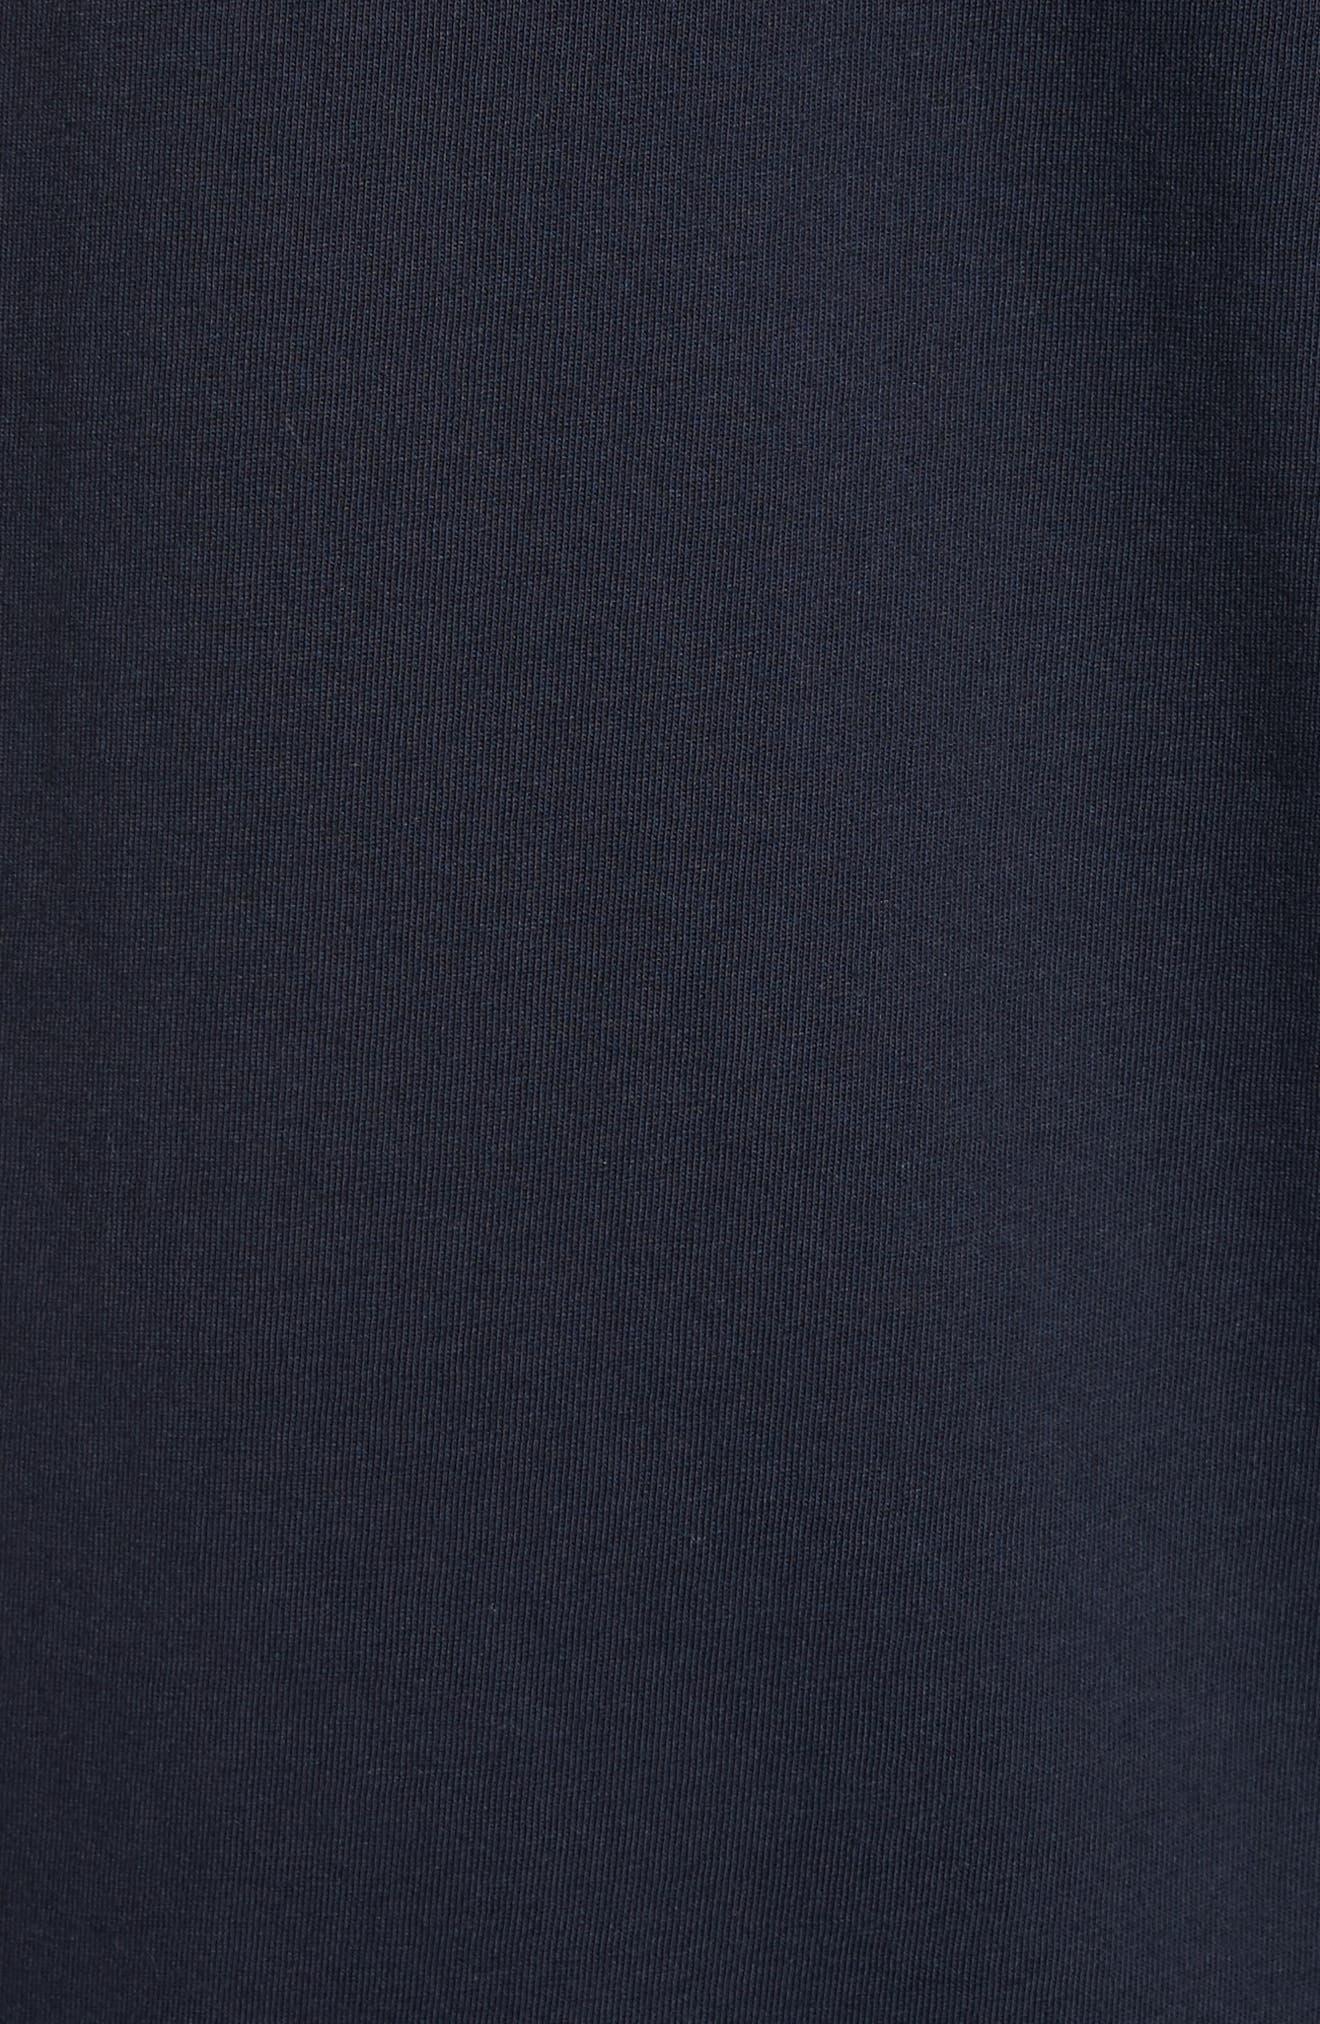 Alternate Image 5  - Saturdays NYC Stacked Graphic T-Shirt